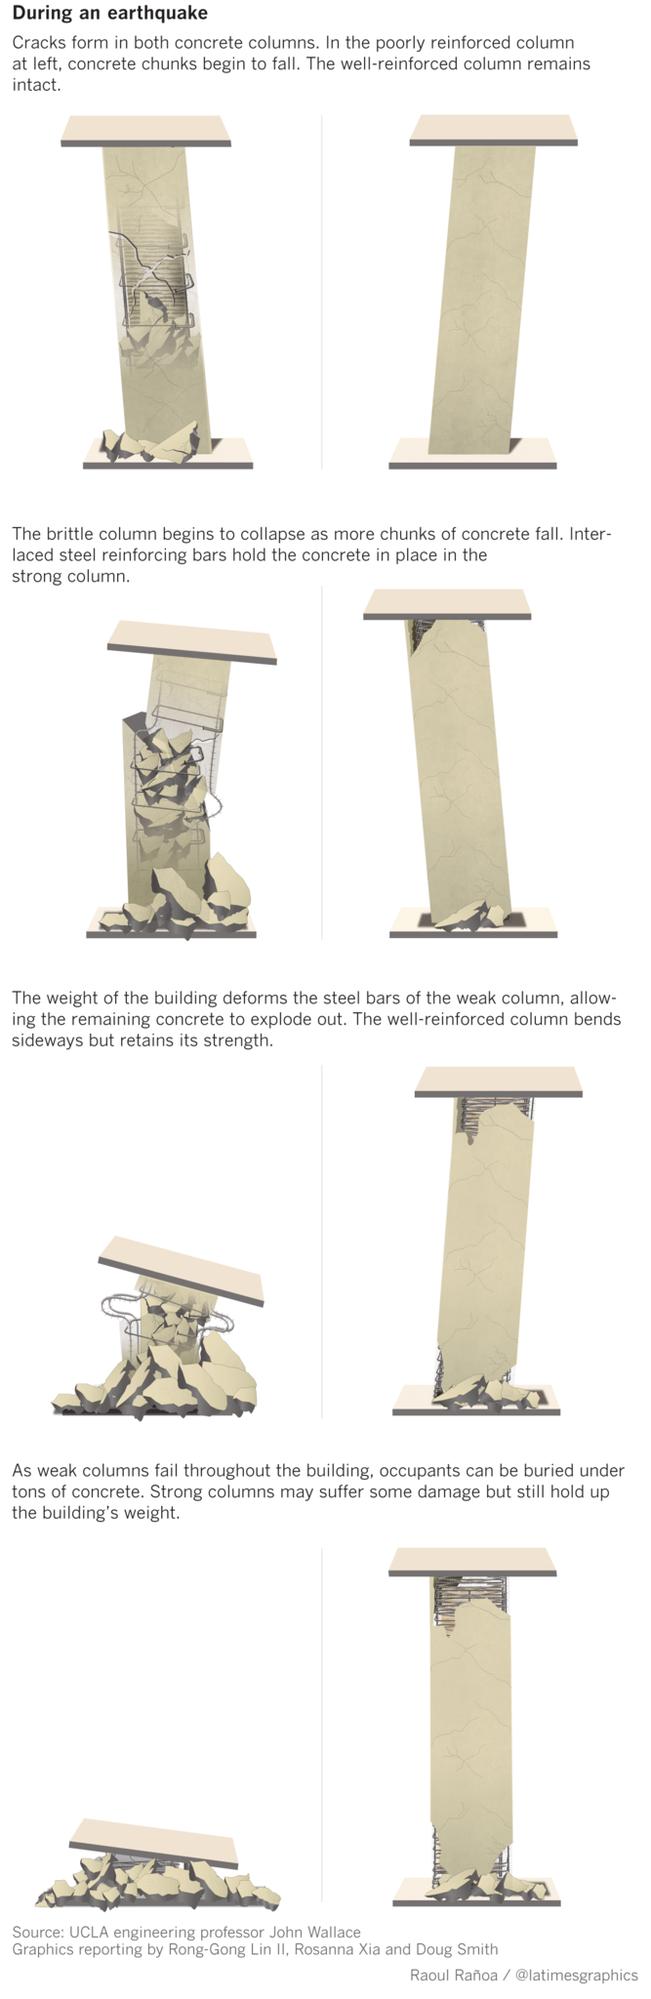 Quake damage to concrete columns